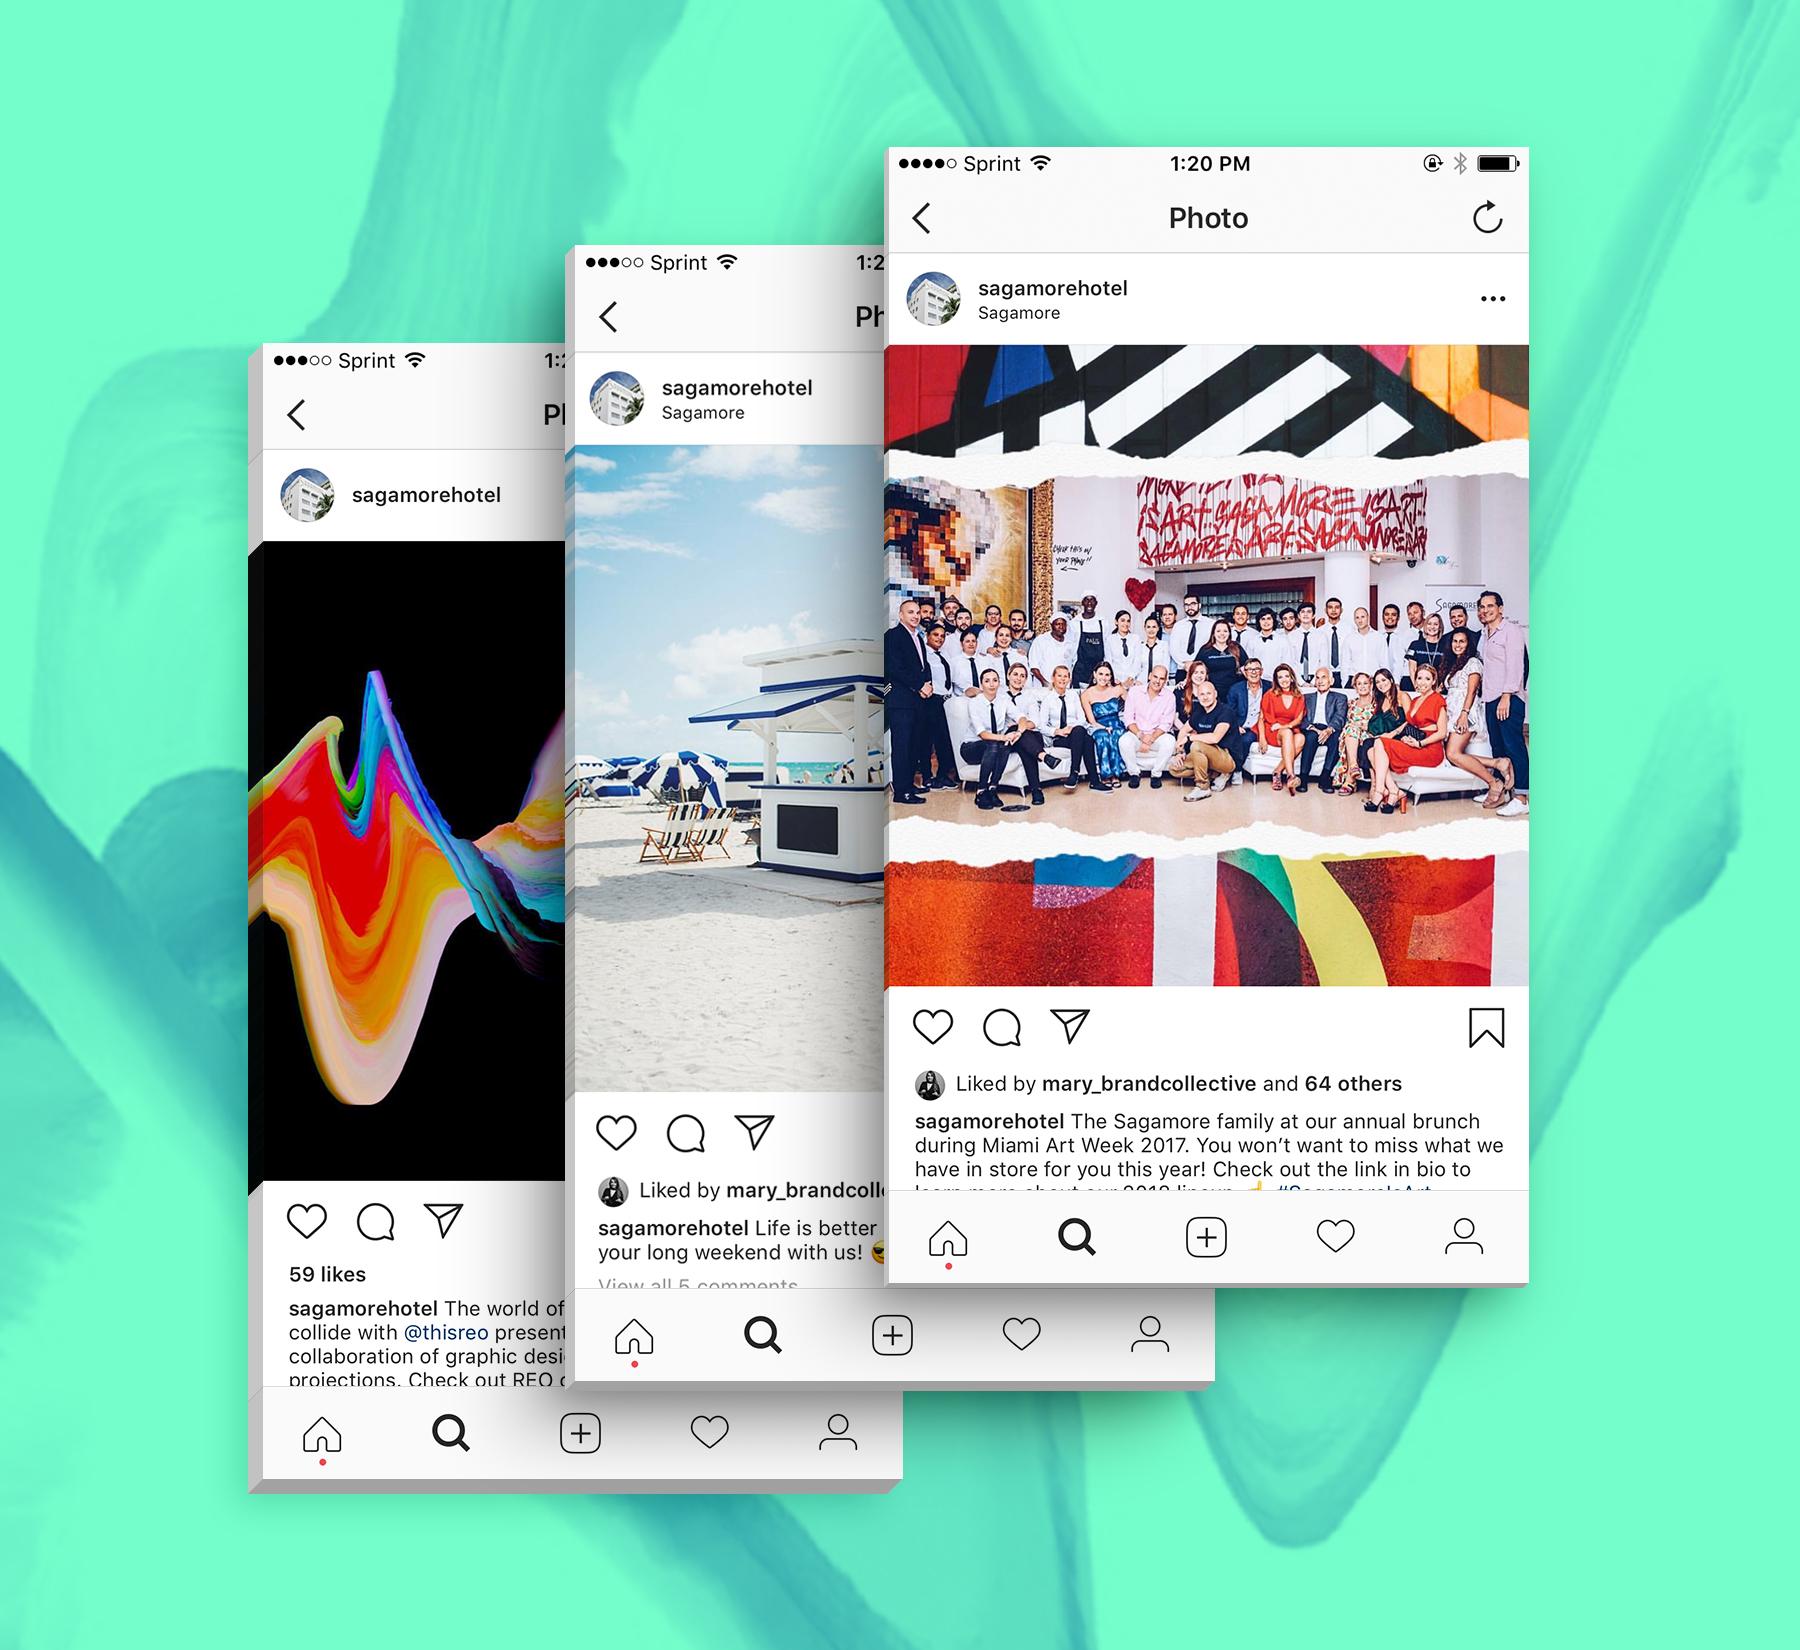 sagamore social media